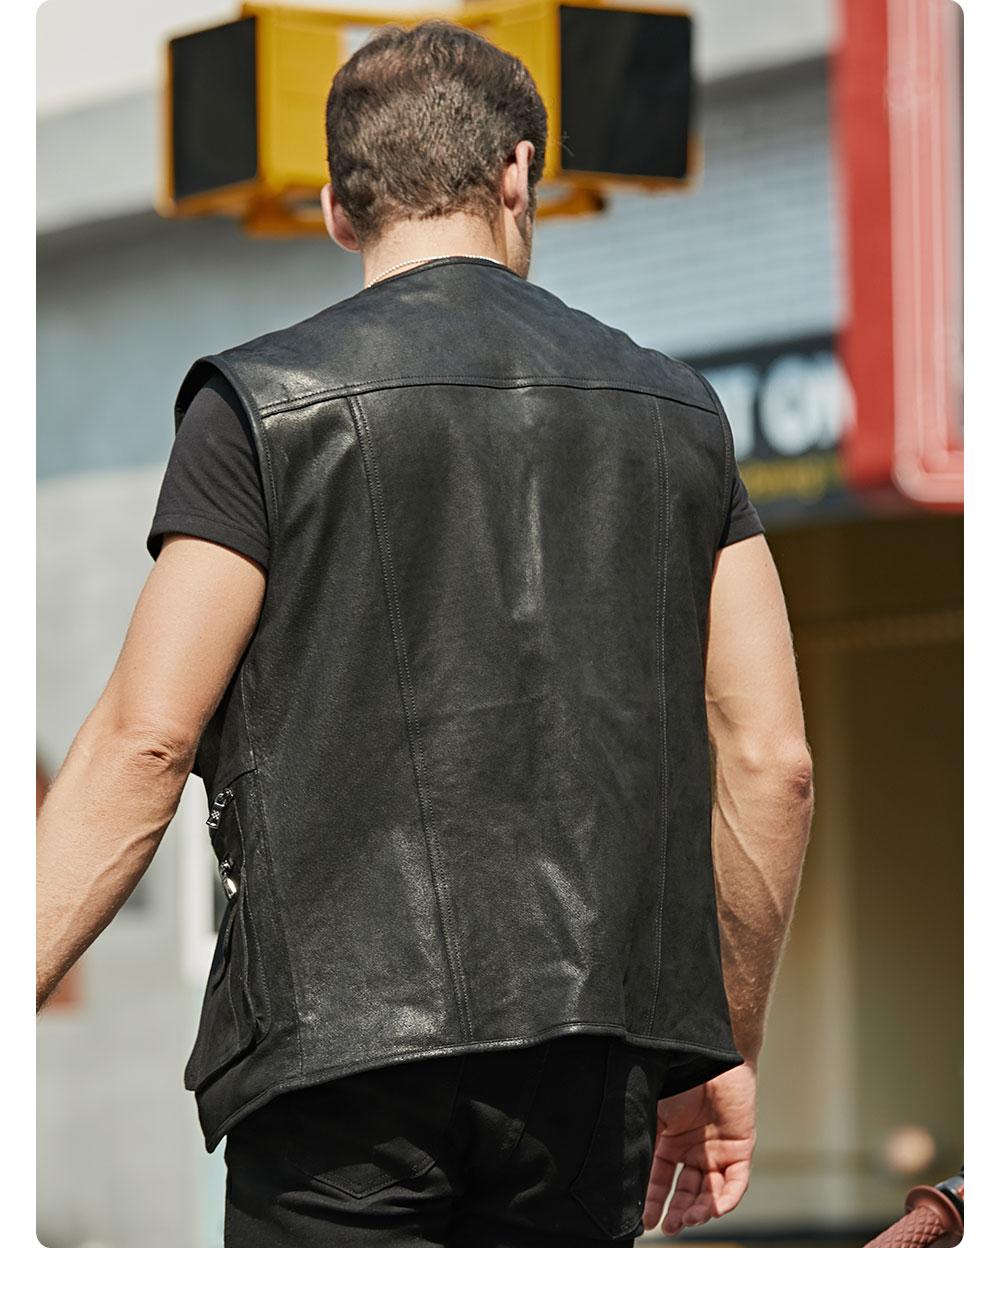 H1f1885bb50c54f82b8ffc7ebb10e21e3s FLAVOR New Men's Real Leather Vest Men's Motorcycle Fishing Outdoor Travel Vests